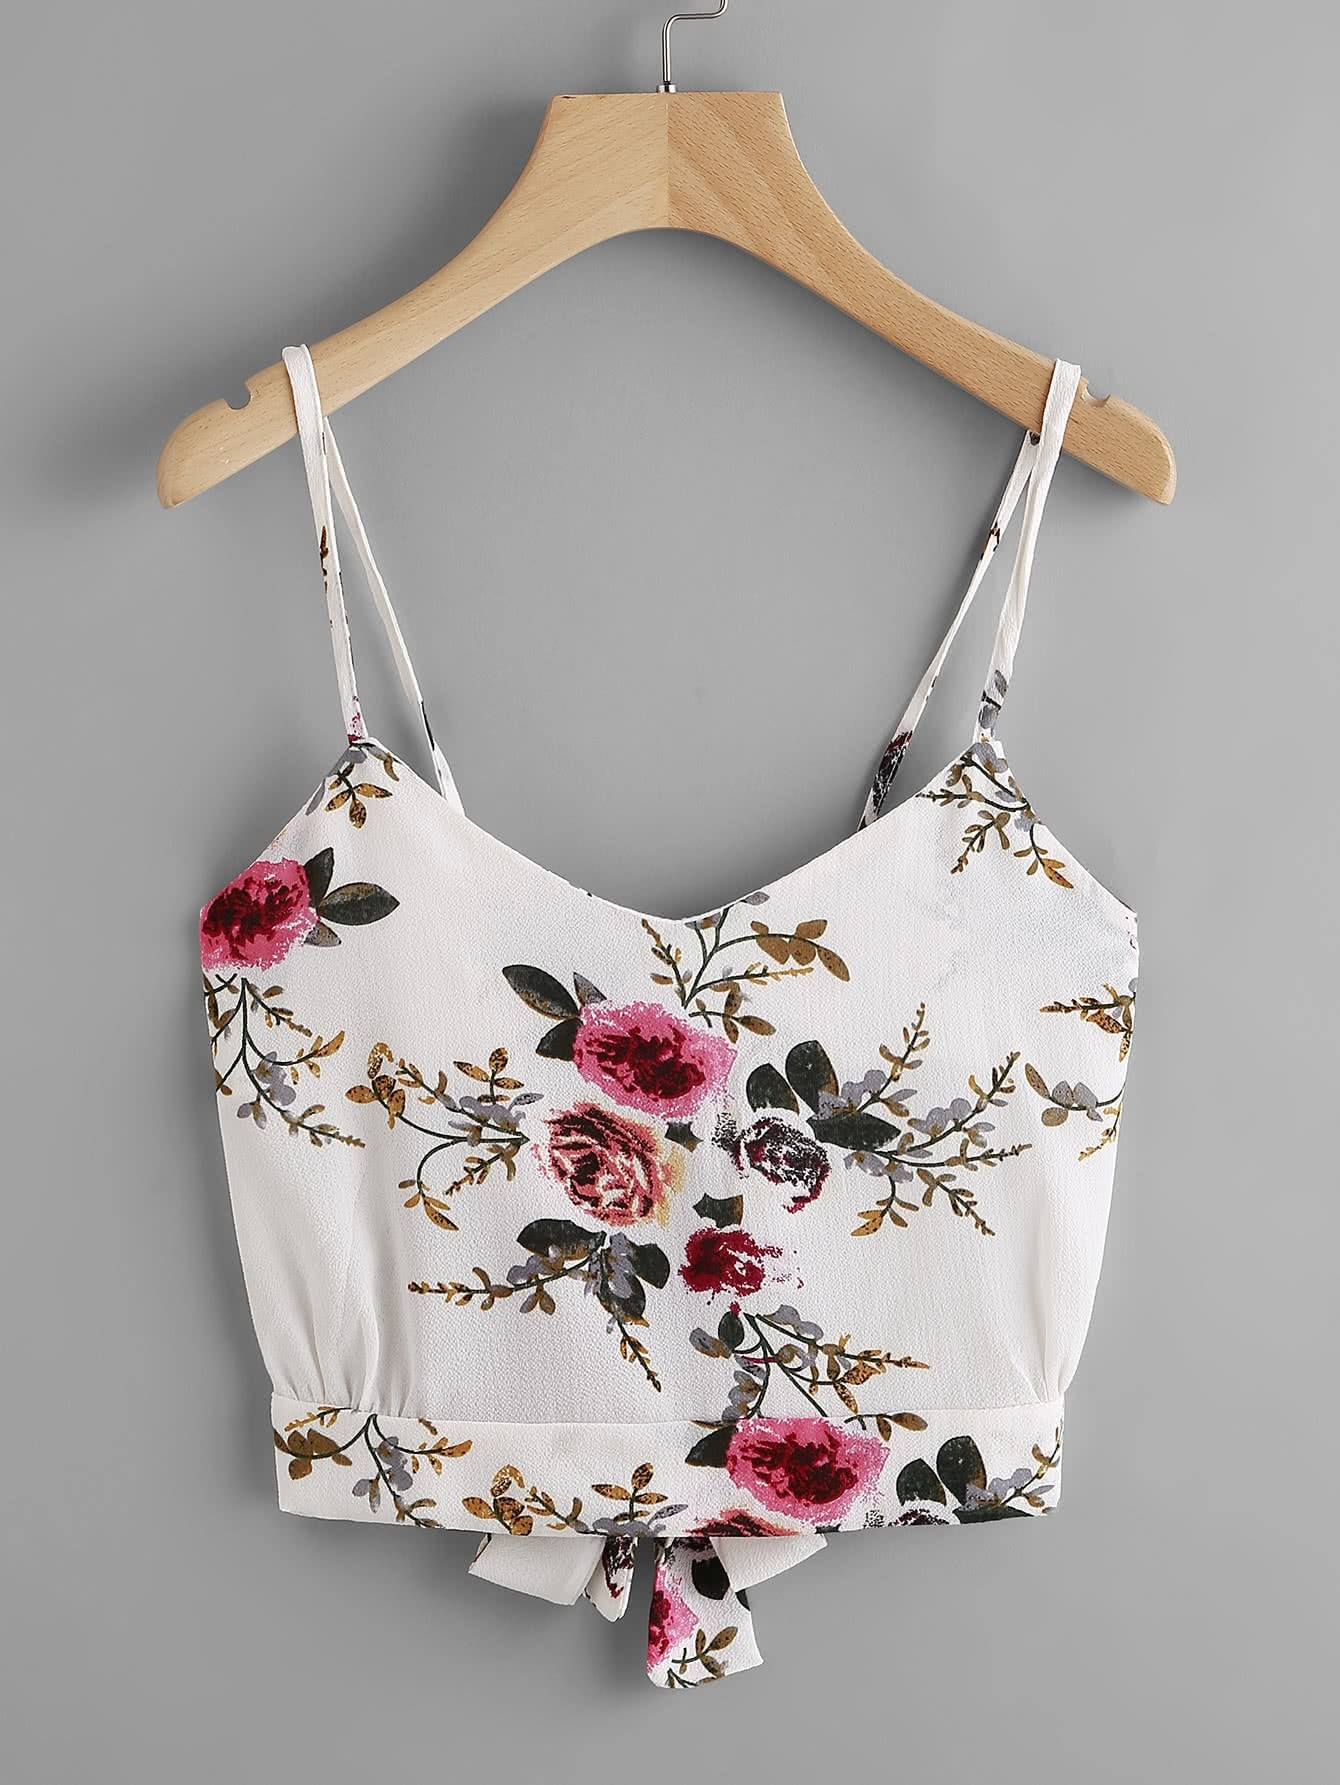 Floral Print Random Split Tie Back Cami Top RVES170519003